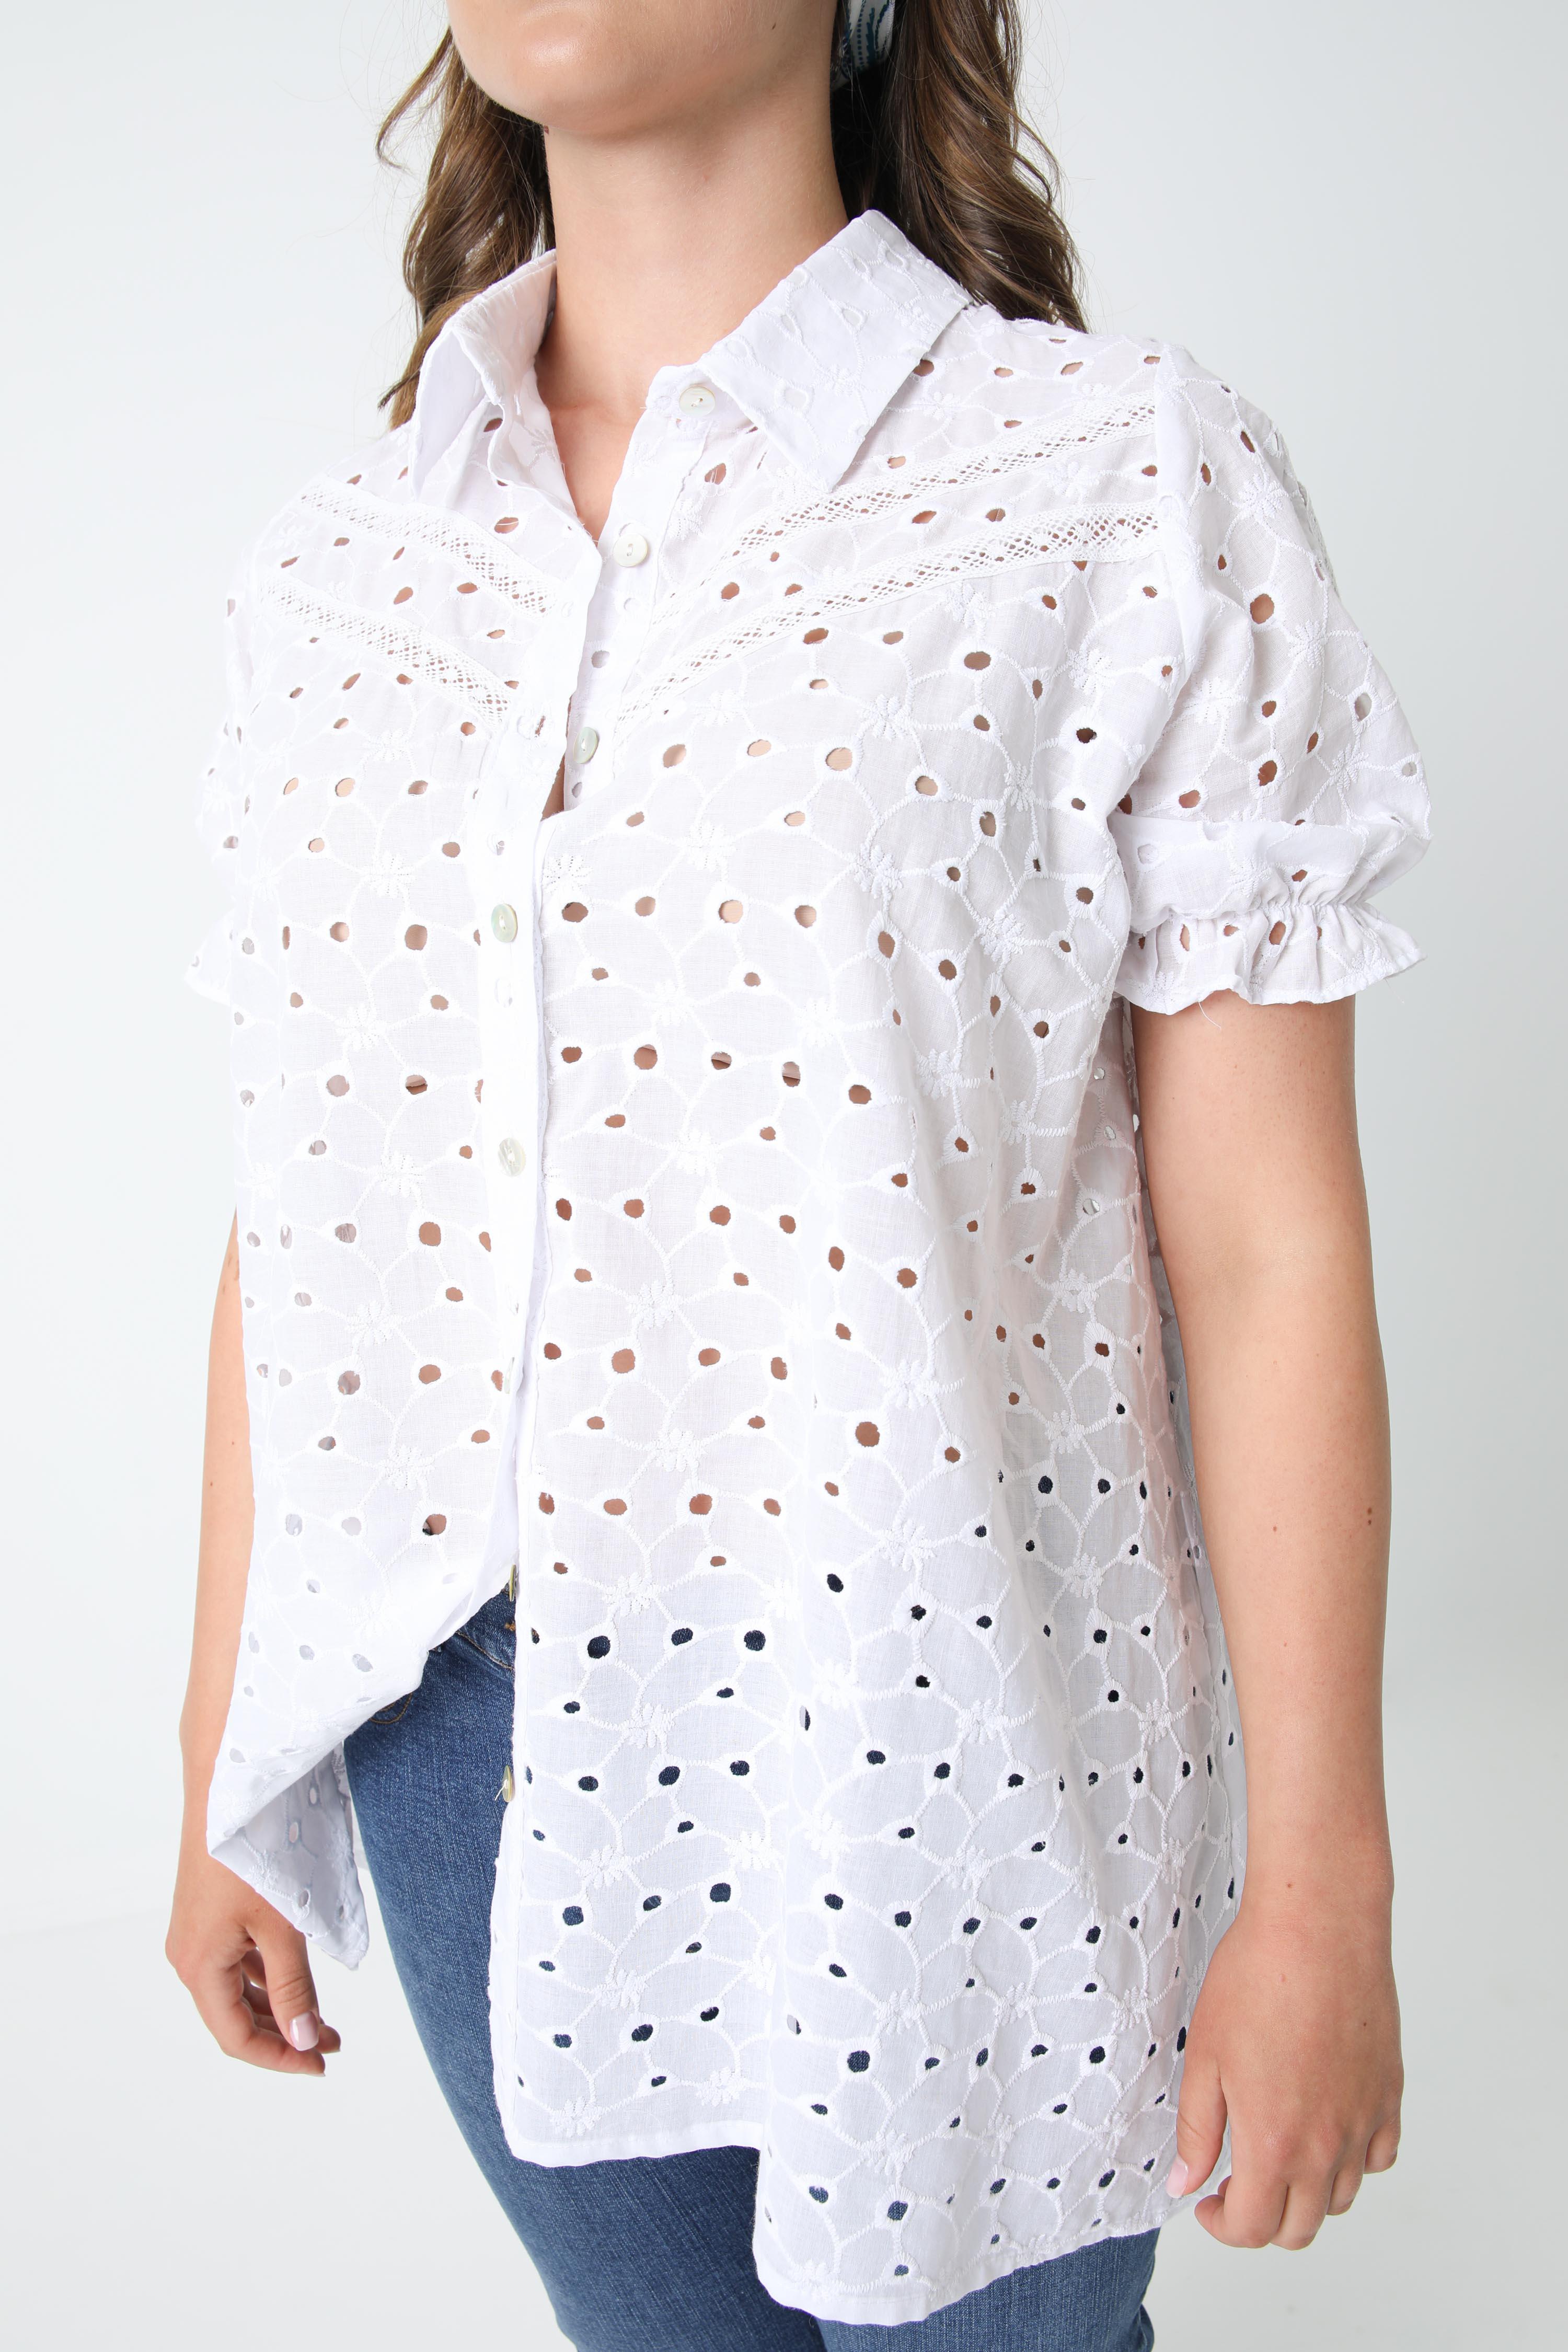 English embroidery shirt